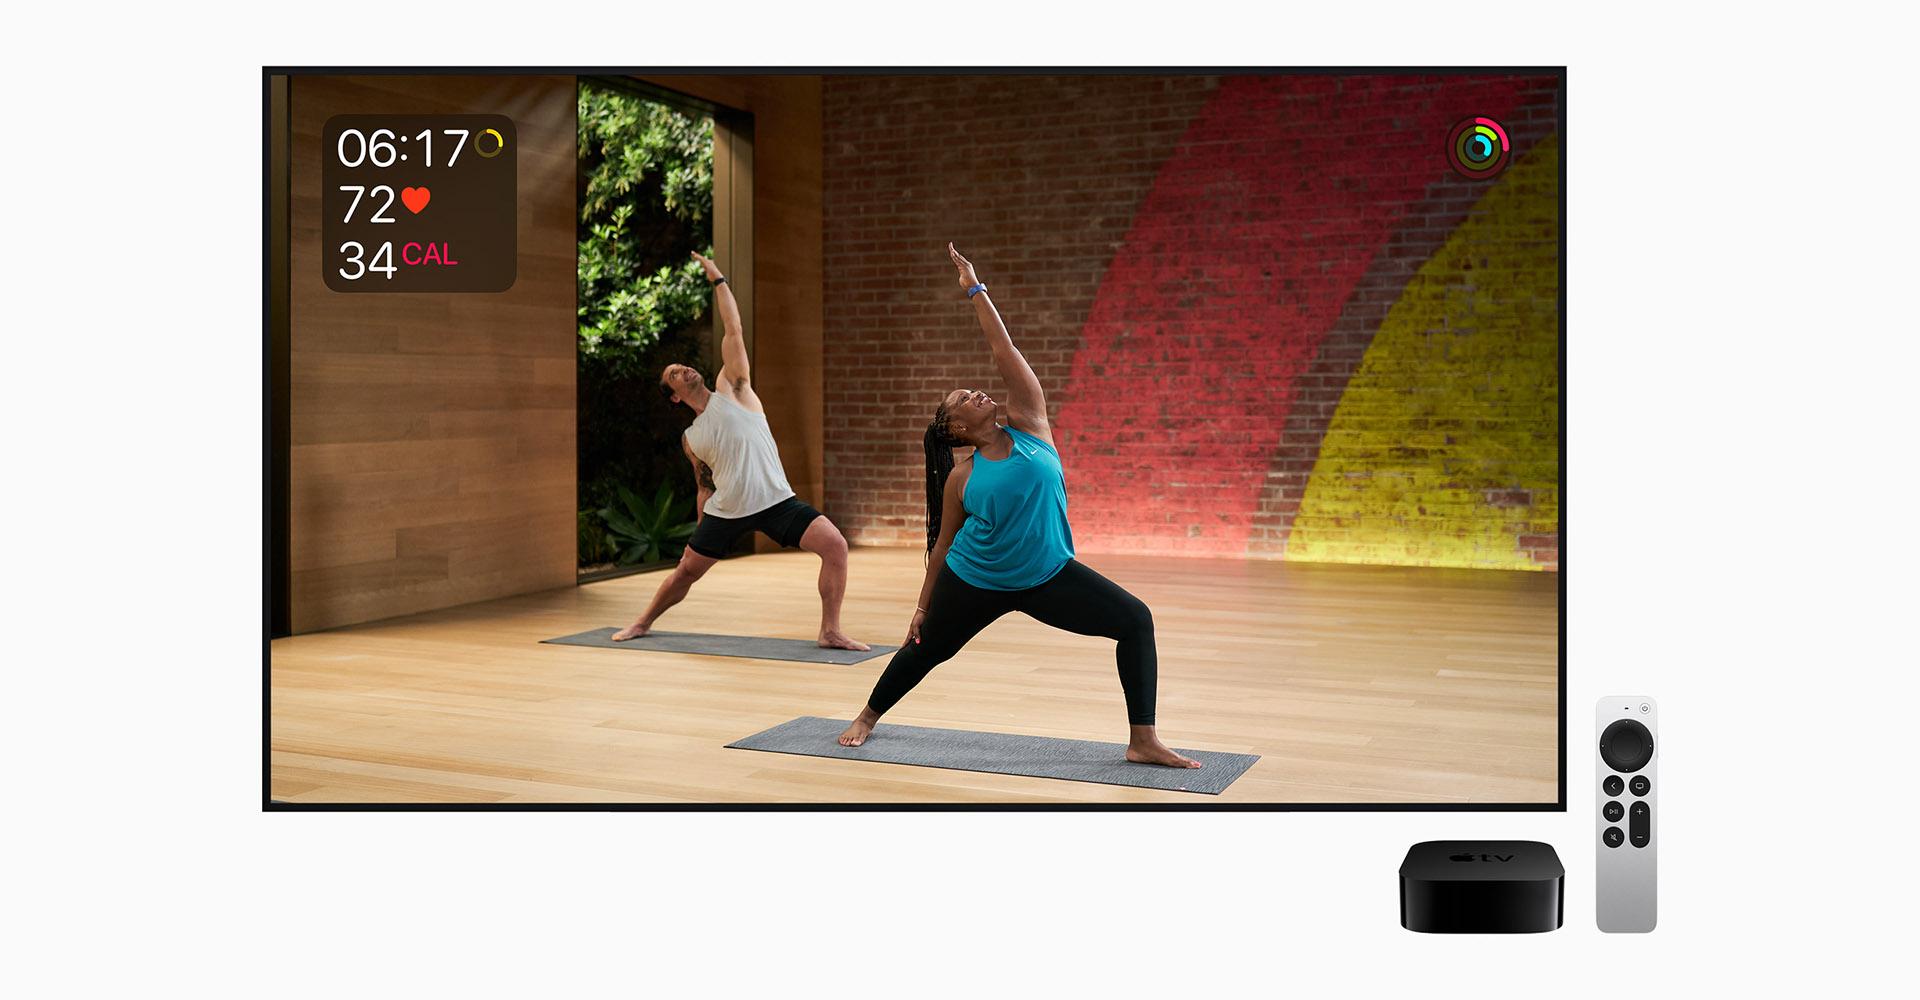 Ftiness-Screen des neuen Apple TV 4K (2021)